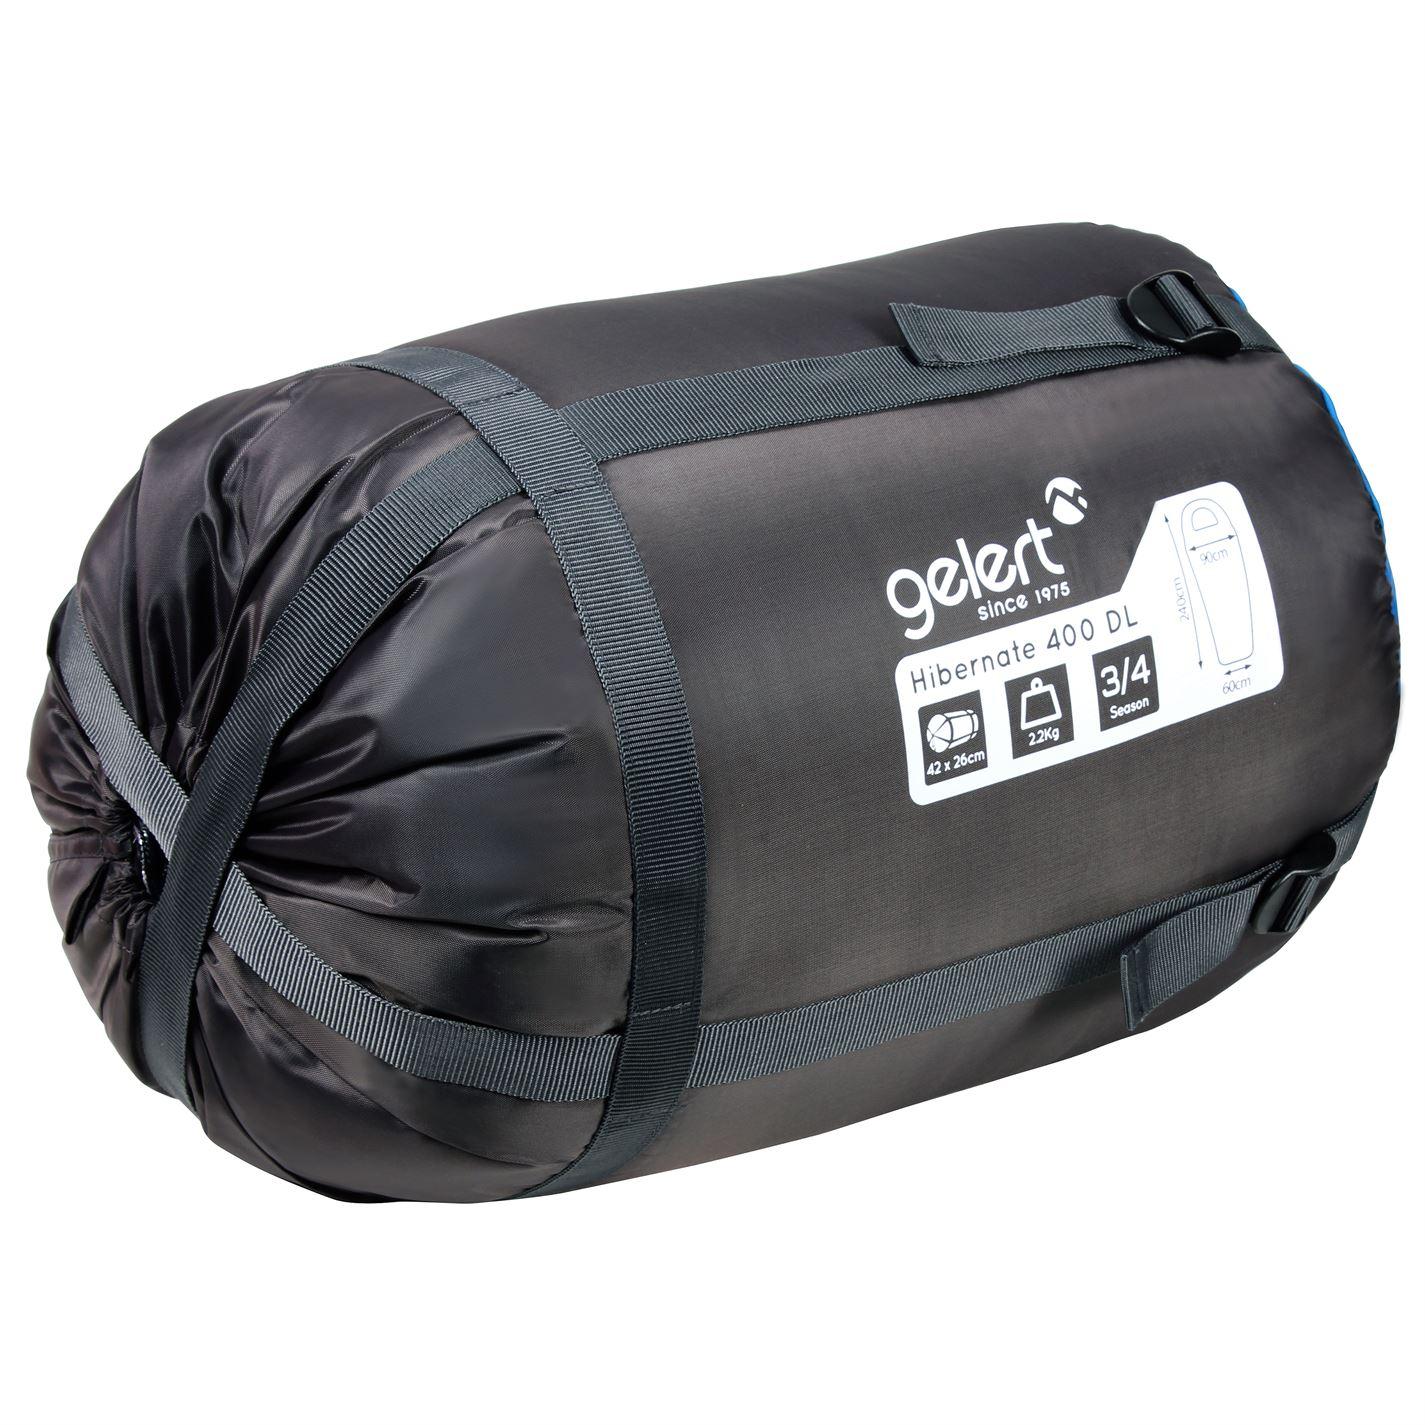 Gelert Hibernate 400 S/Bag